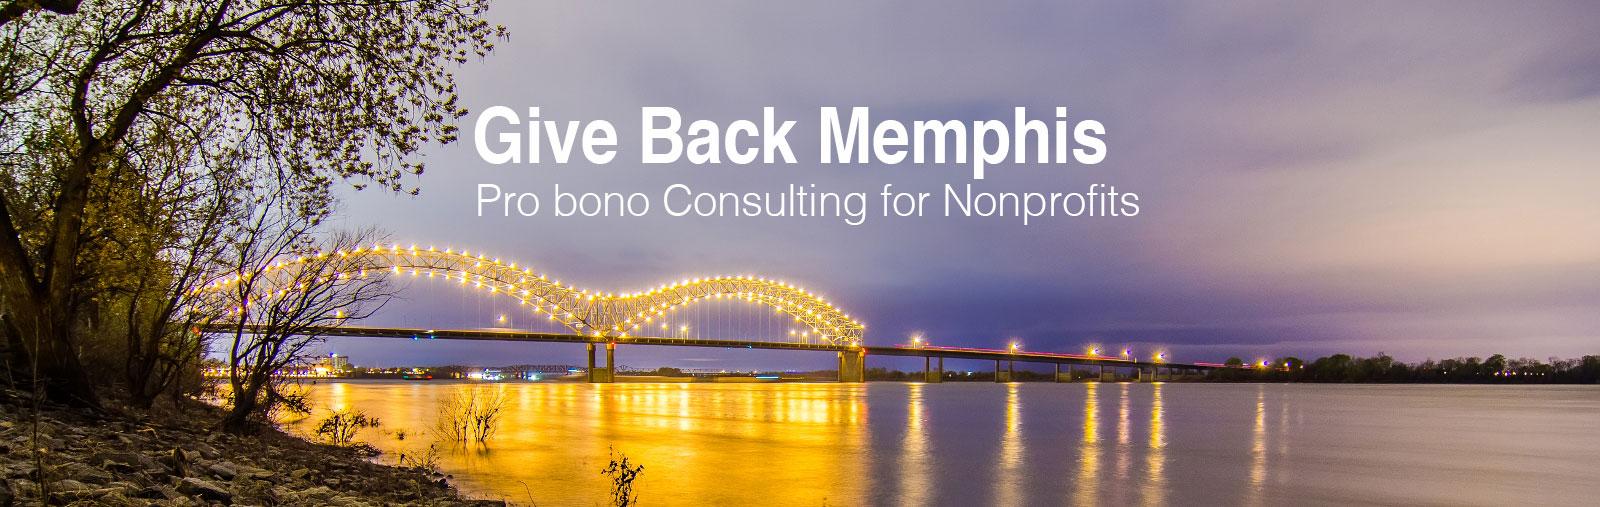 Give Back Memphis